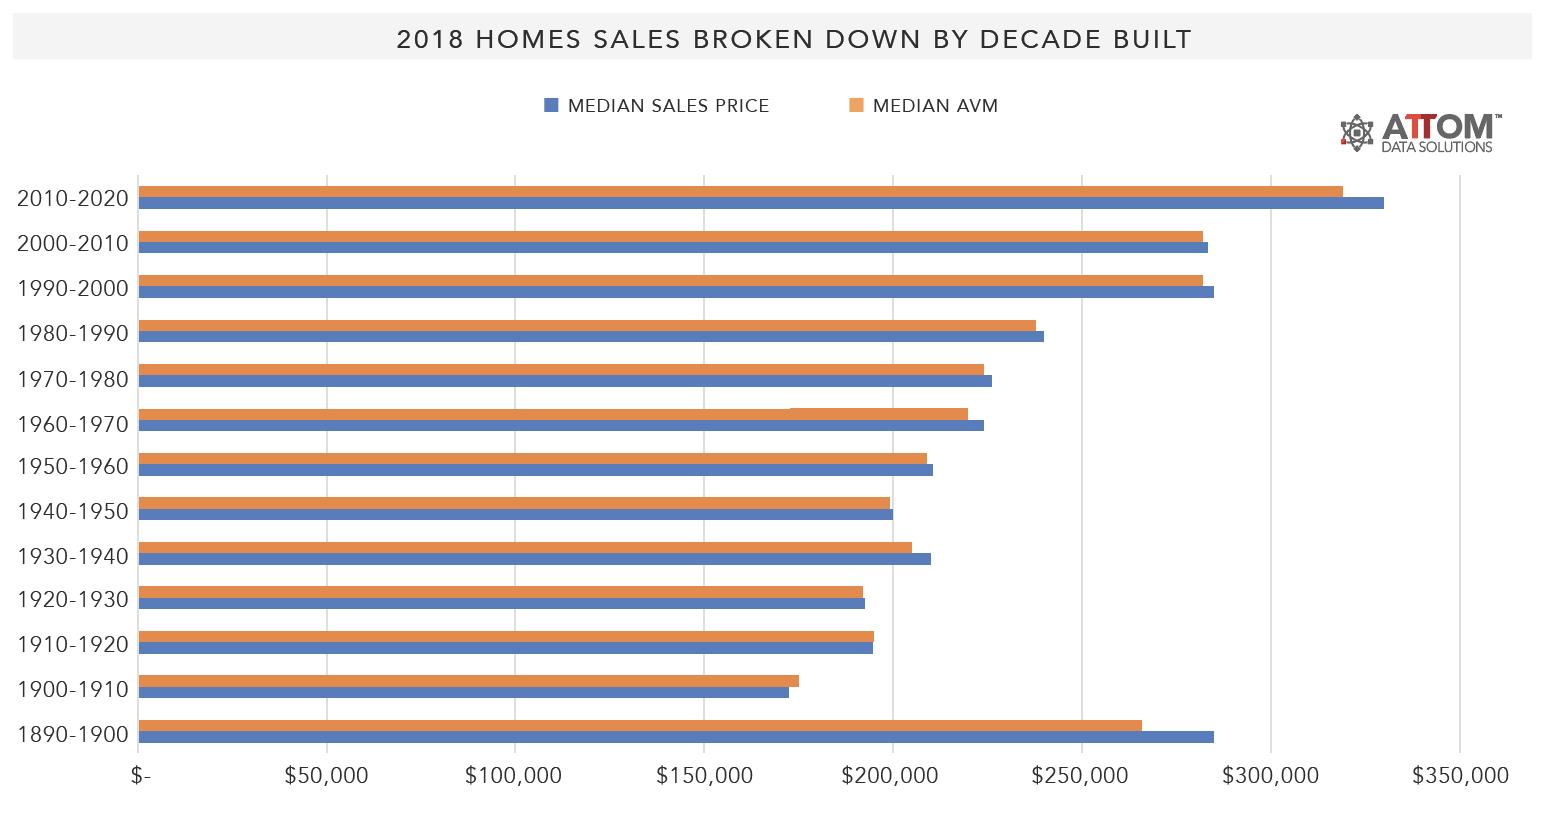 2018-Homes-Sales-Broken-Down-By-Decade-Built